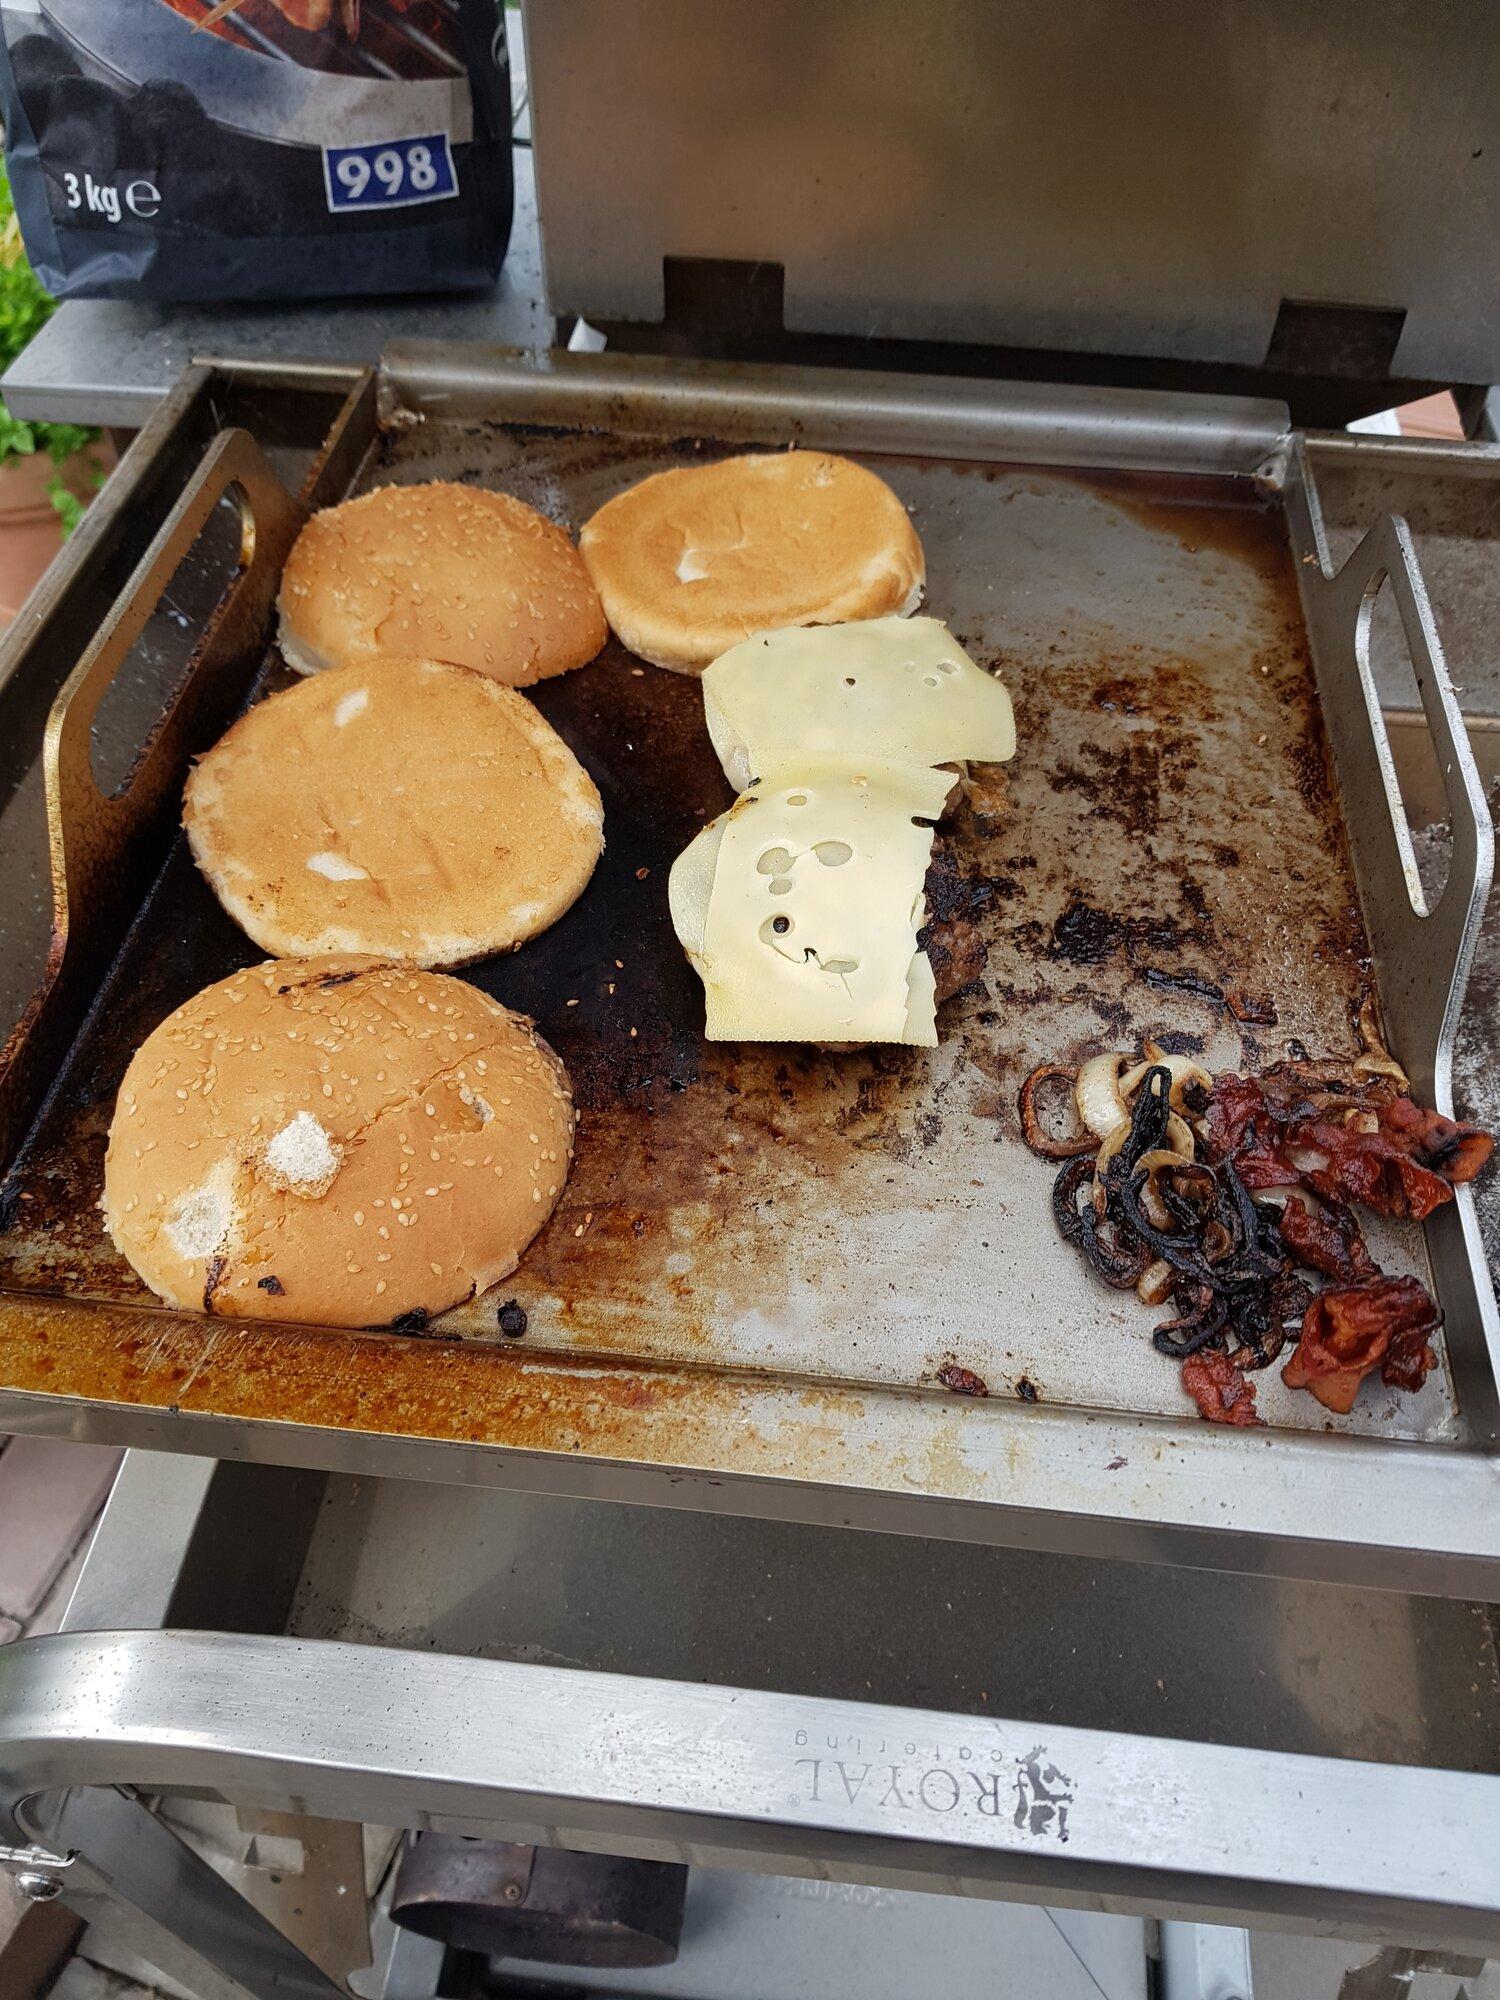 3 Burgerversuch1.jpg